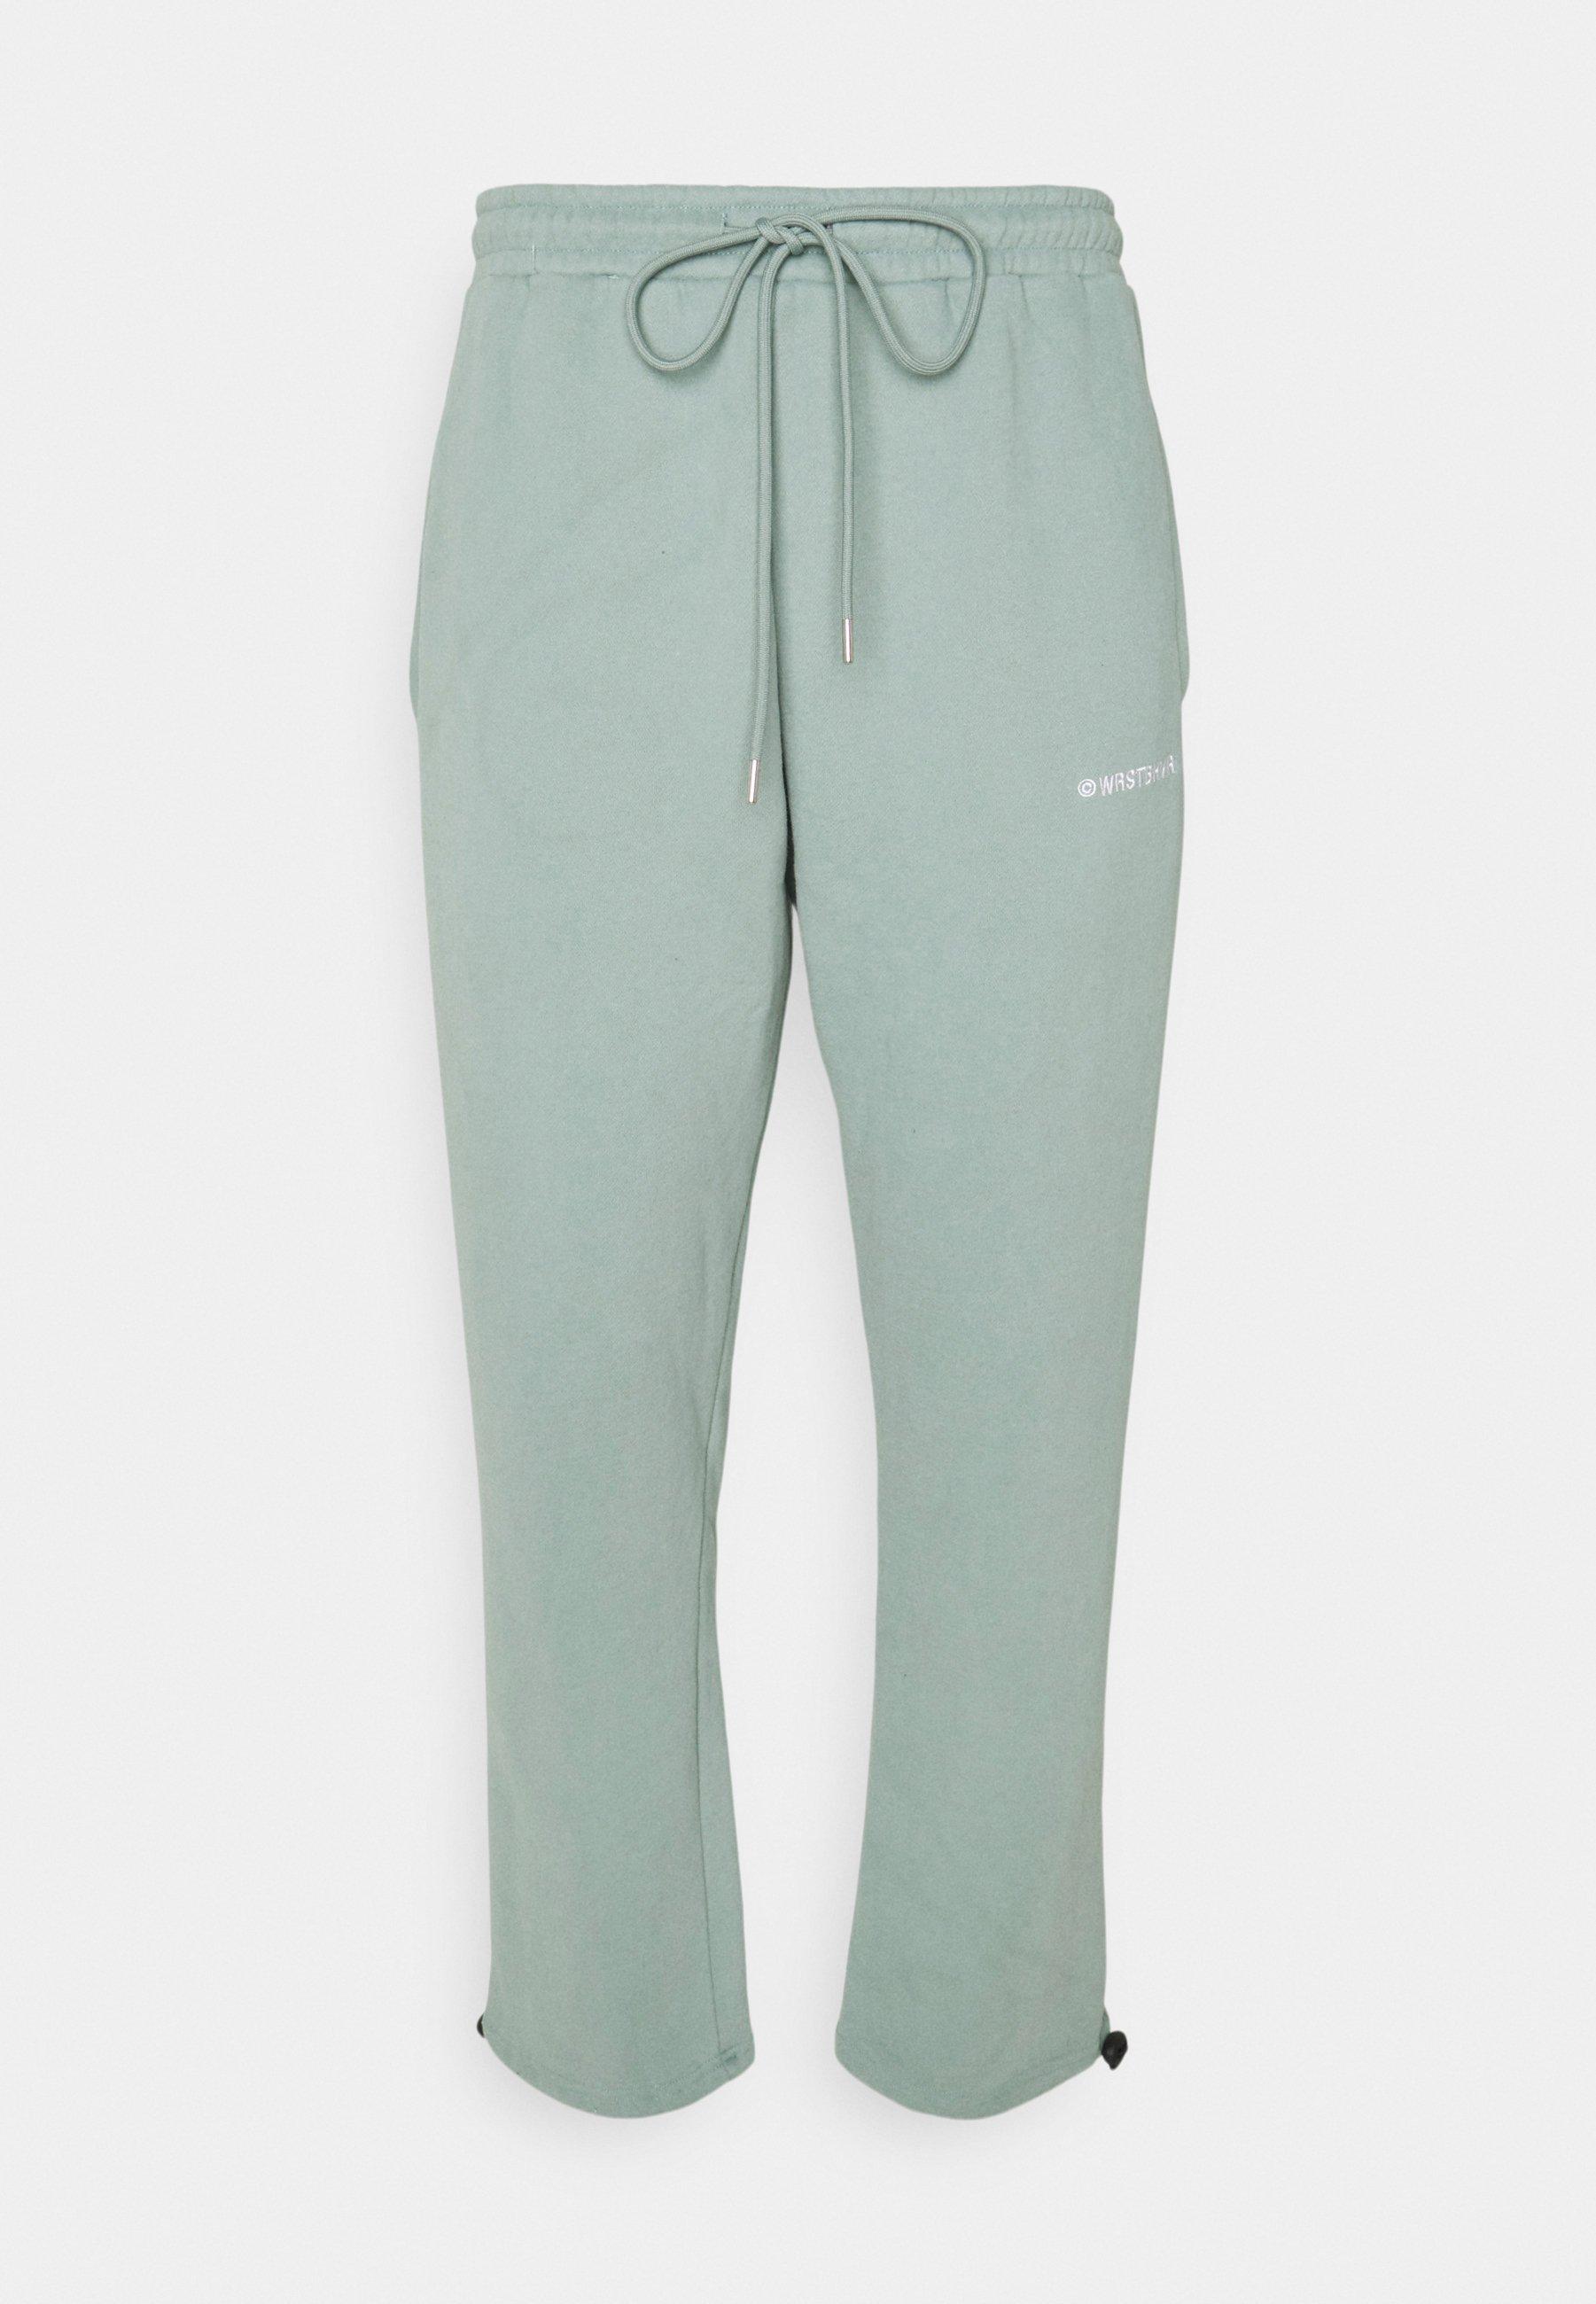 Mujer COLIS PANTS UNISEX - Pantalones deportivos